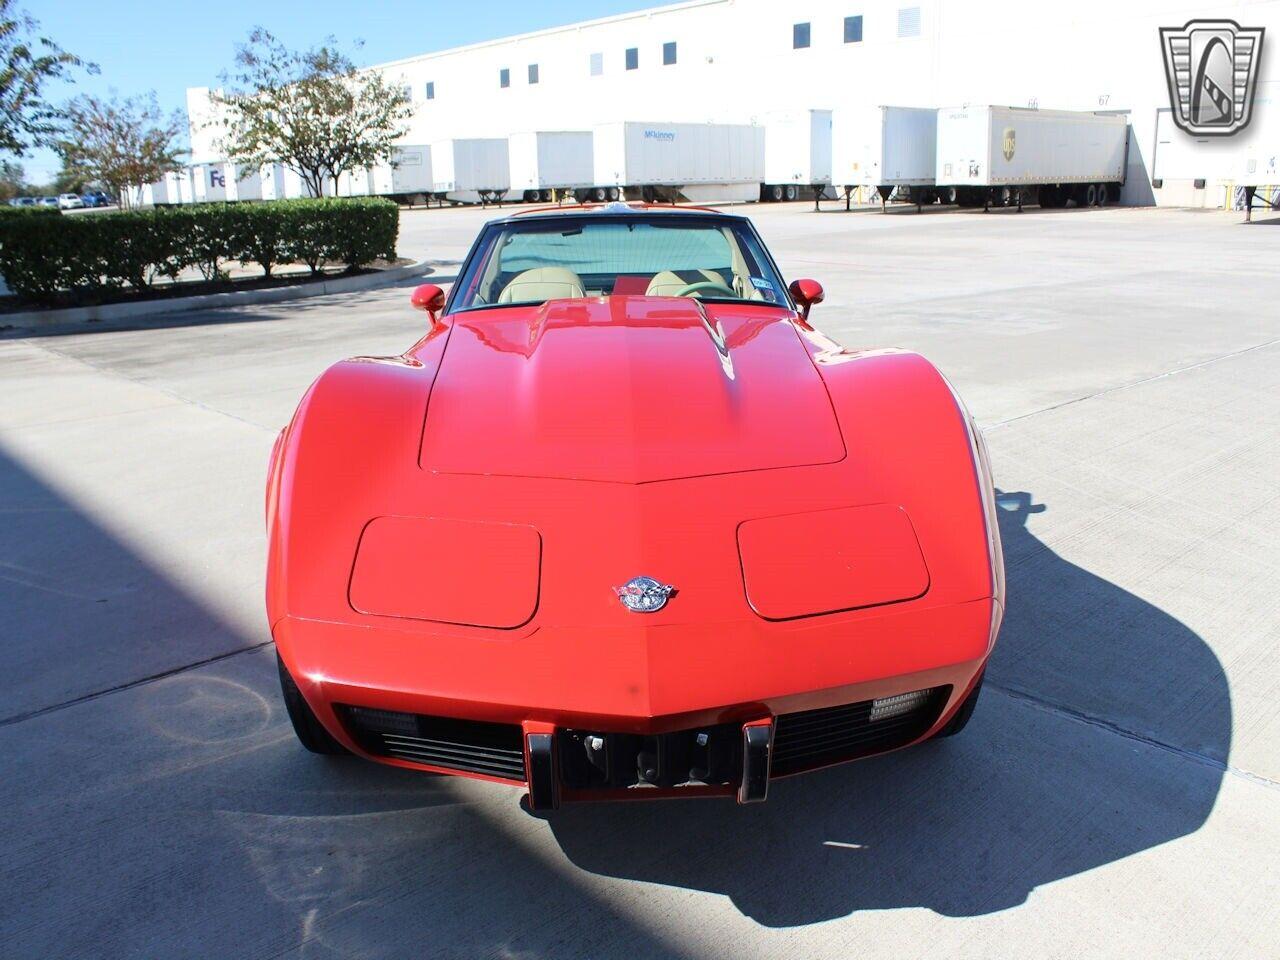 1978 Red Chevrolet Corvette   | C3 Corvette Photo 6